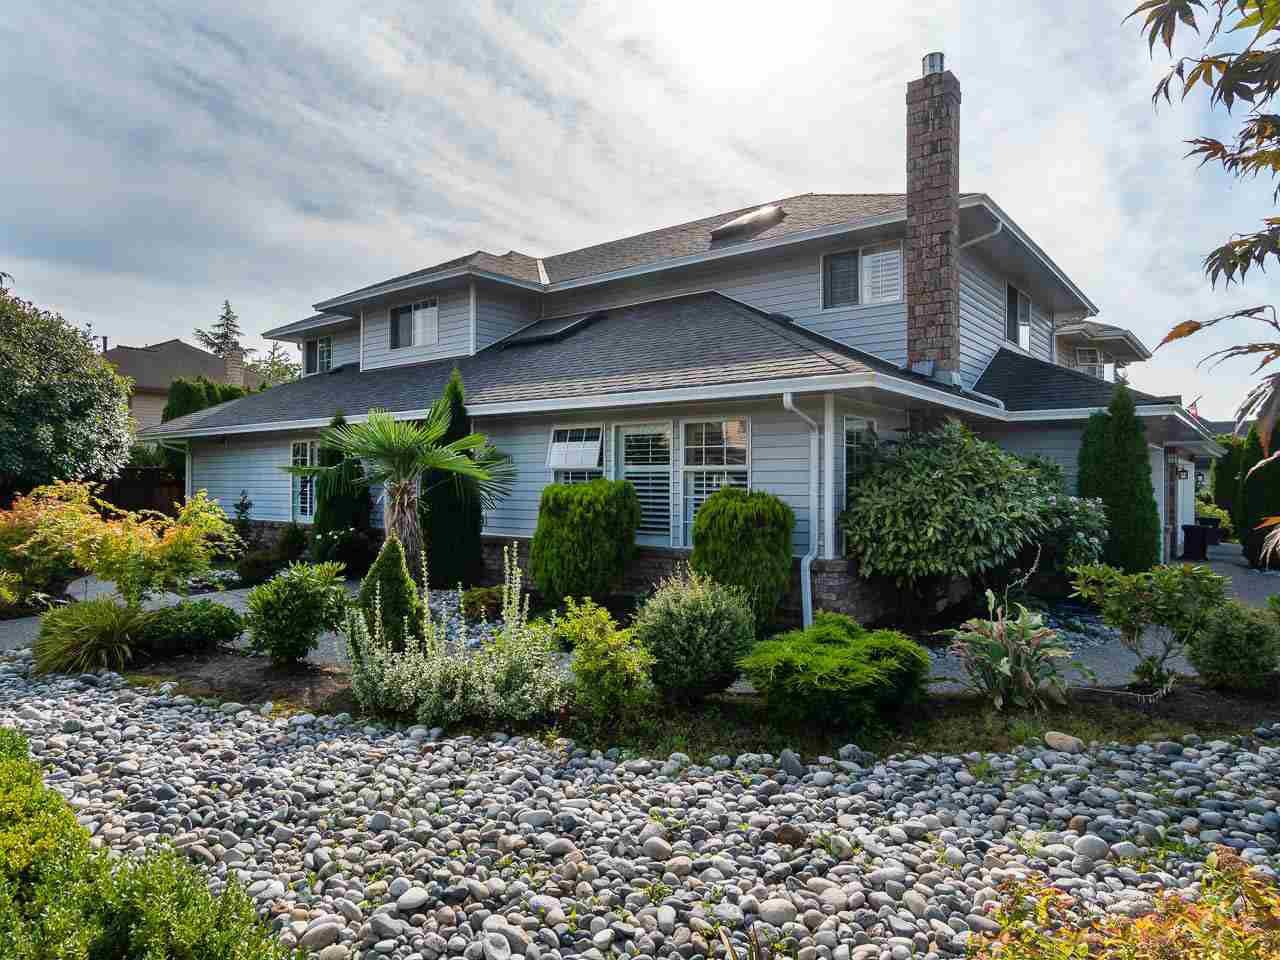 Main Photo: 12211 PHOENIX Drive in Richmond: Steveston South House for sale : MLS®# R2302657